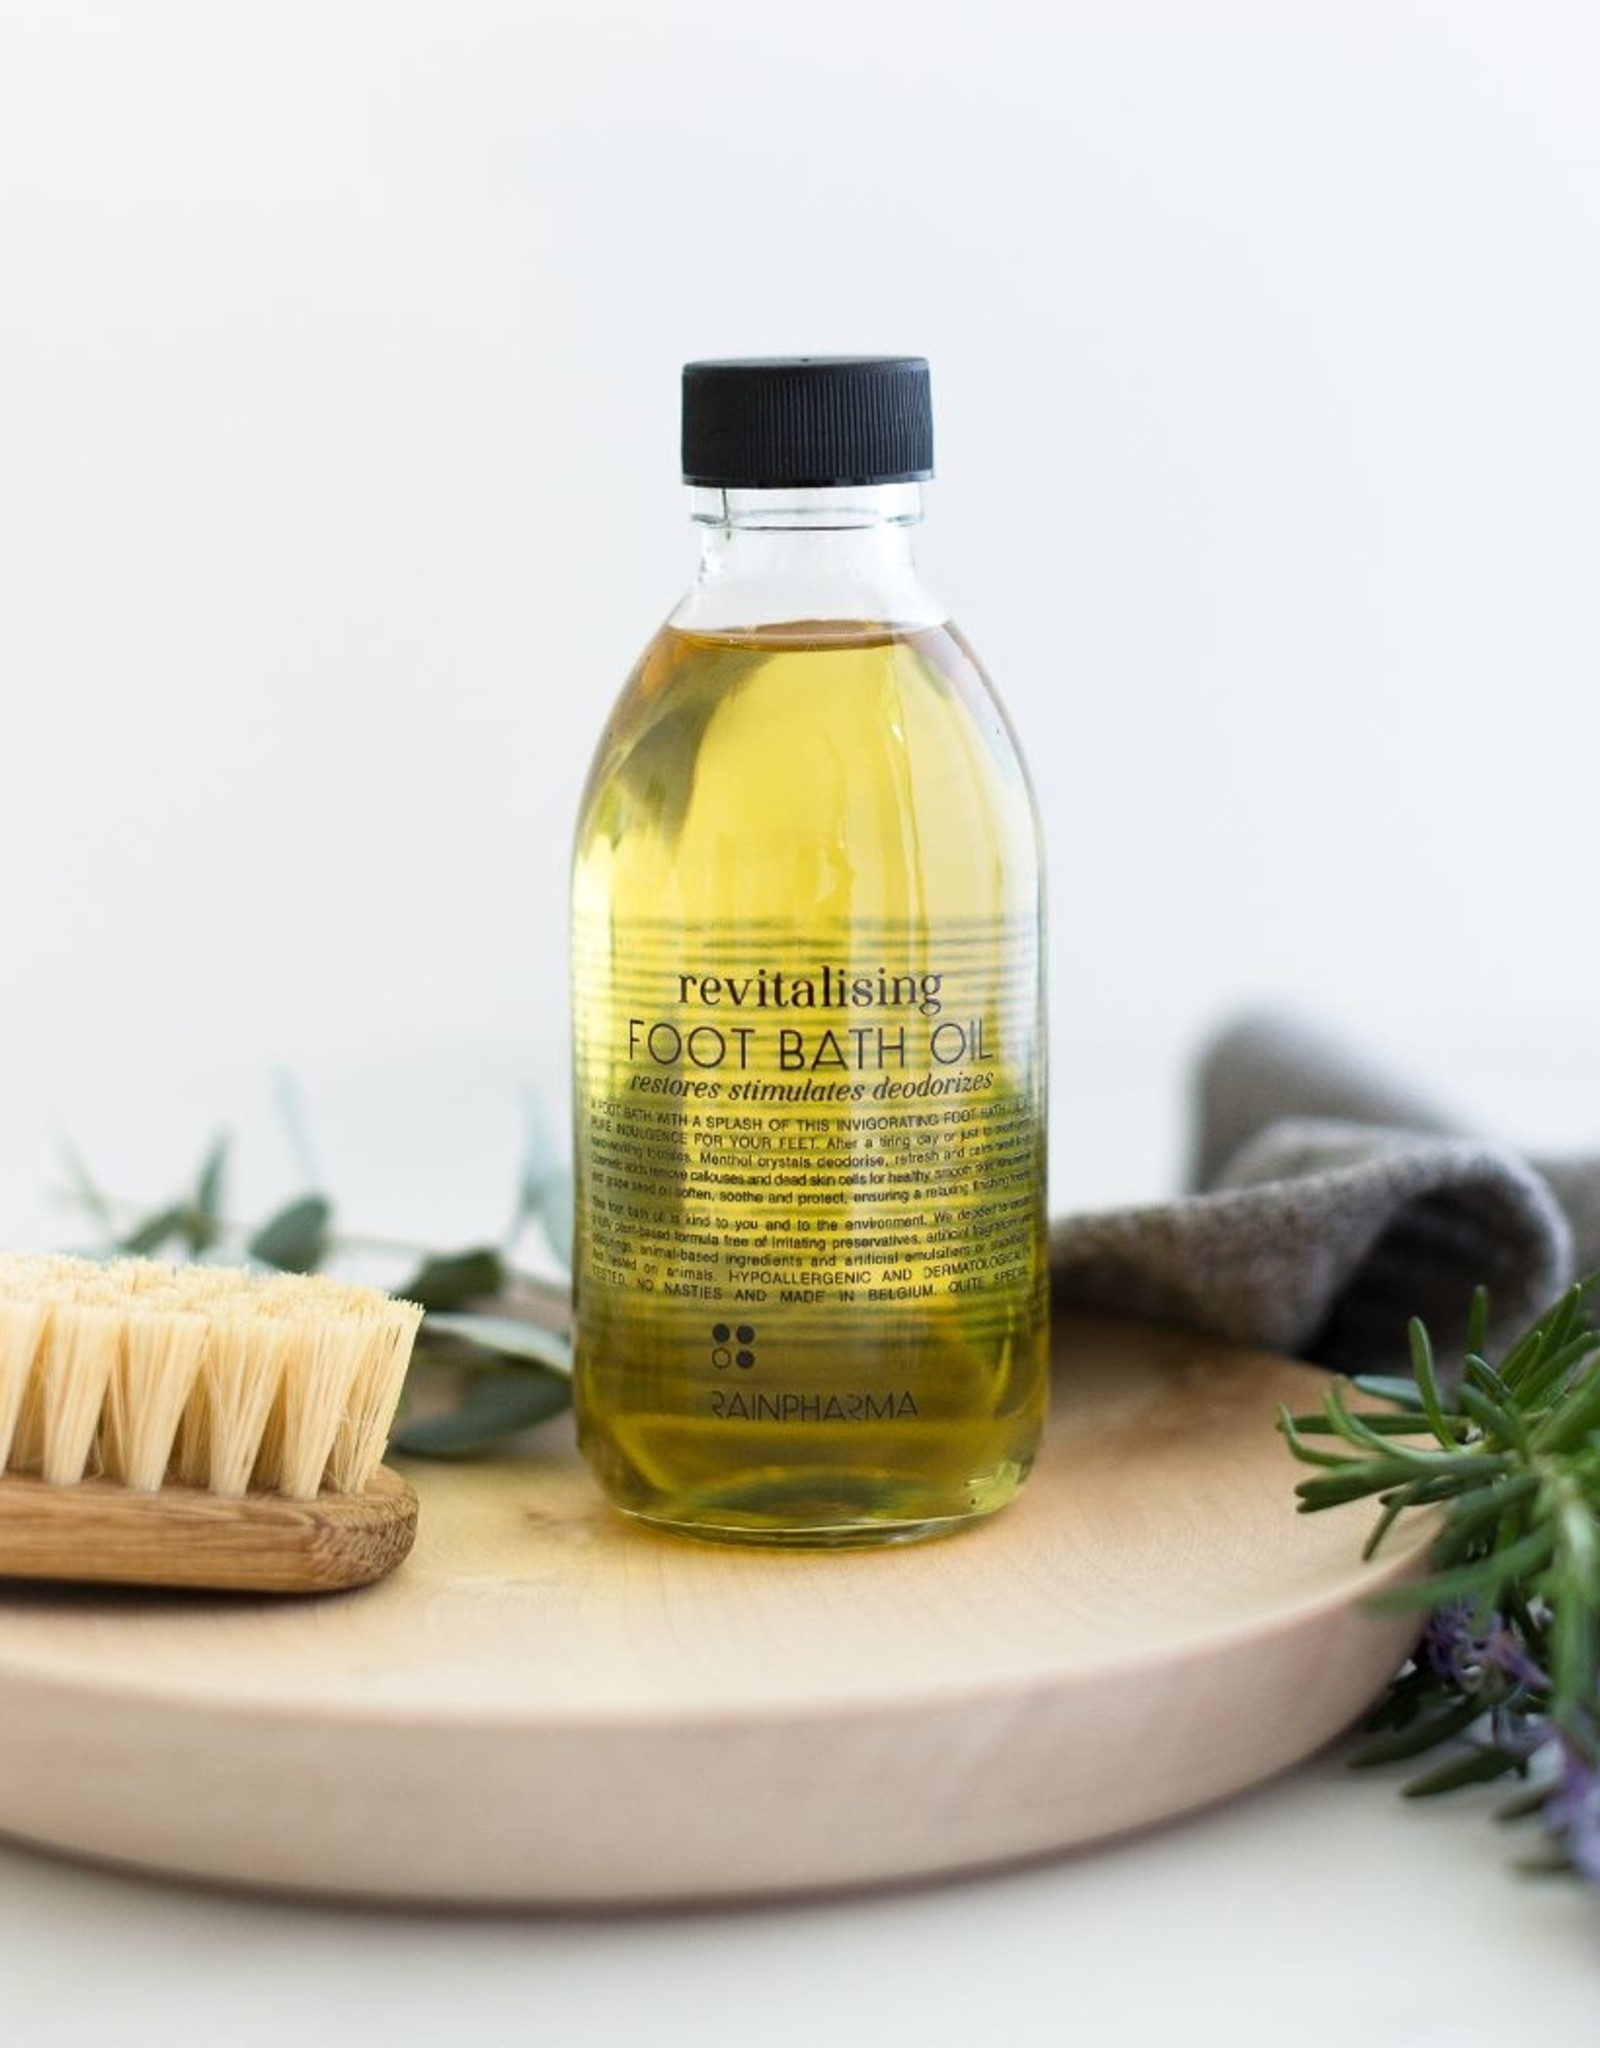 RainPharma Revitalizing Foot Bath Oil 200ml - Rainpharma